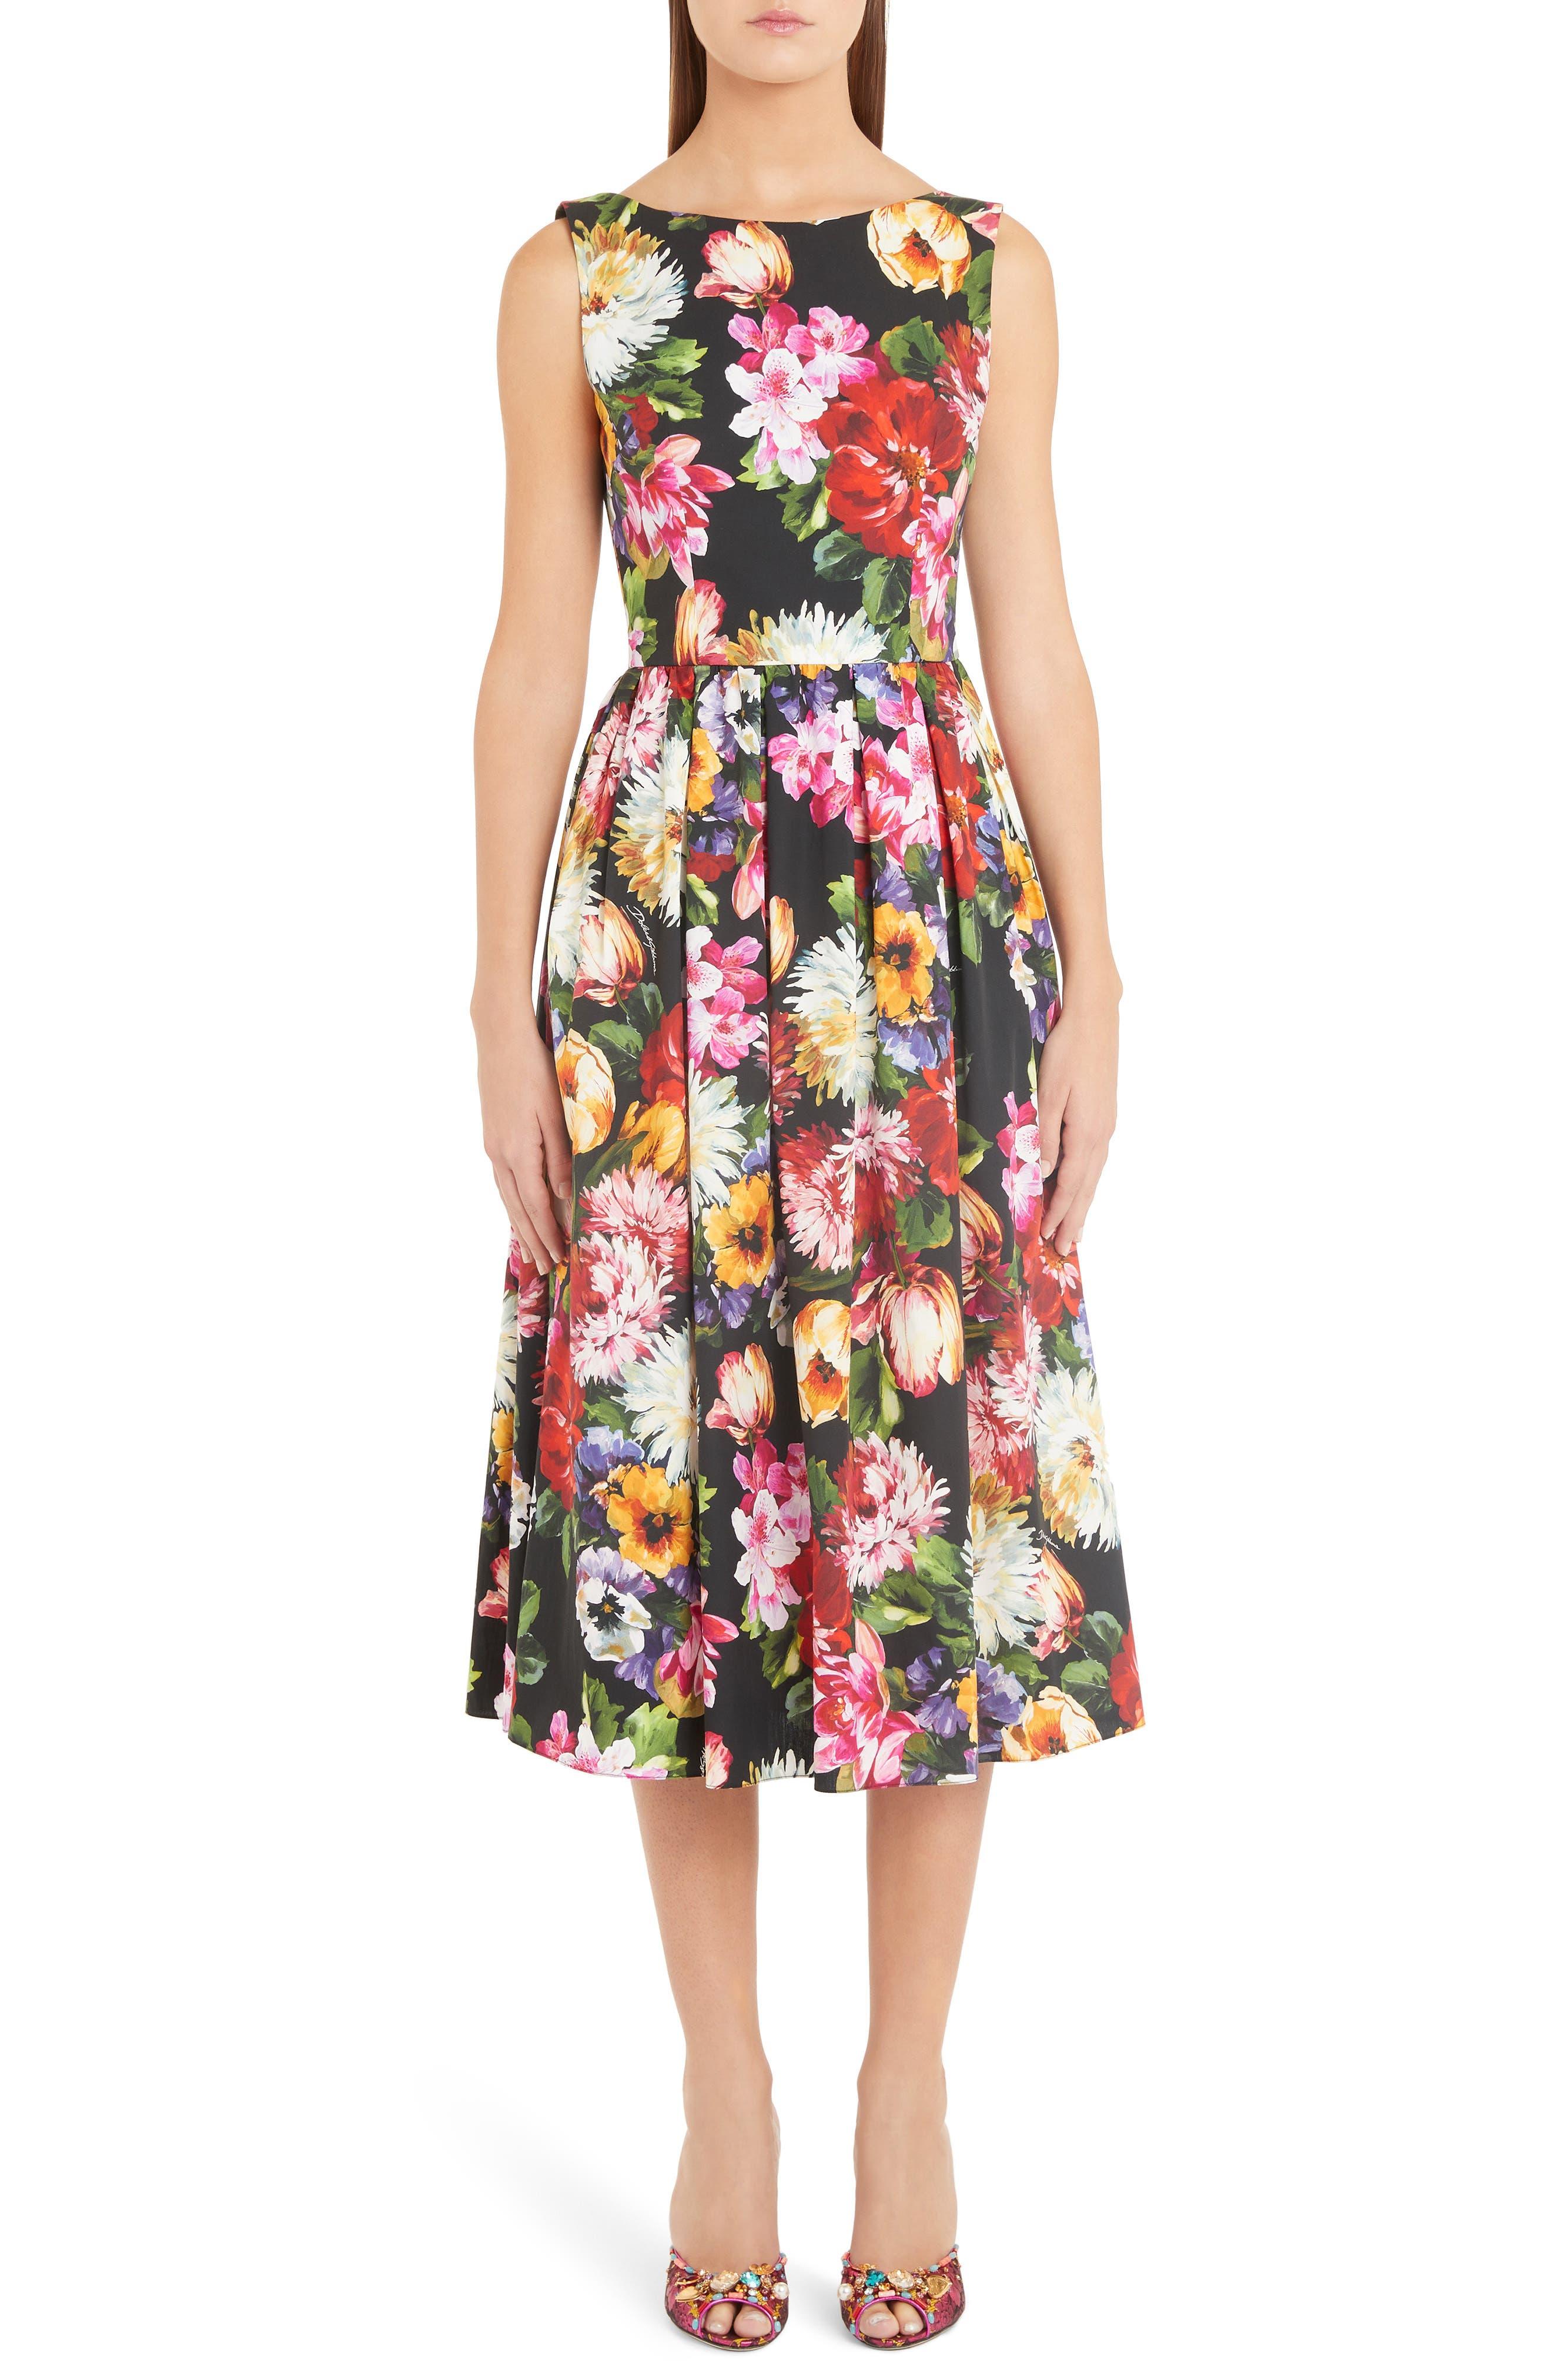 e3d81610 Dolce & gabbana Floral Print A-Line Midi Dress